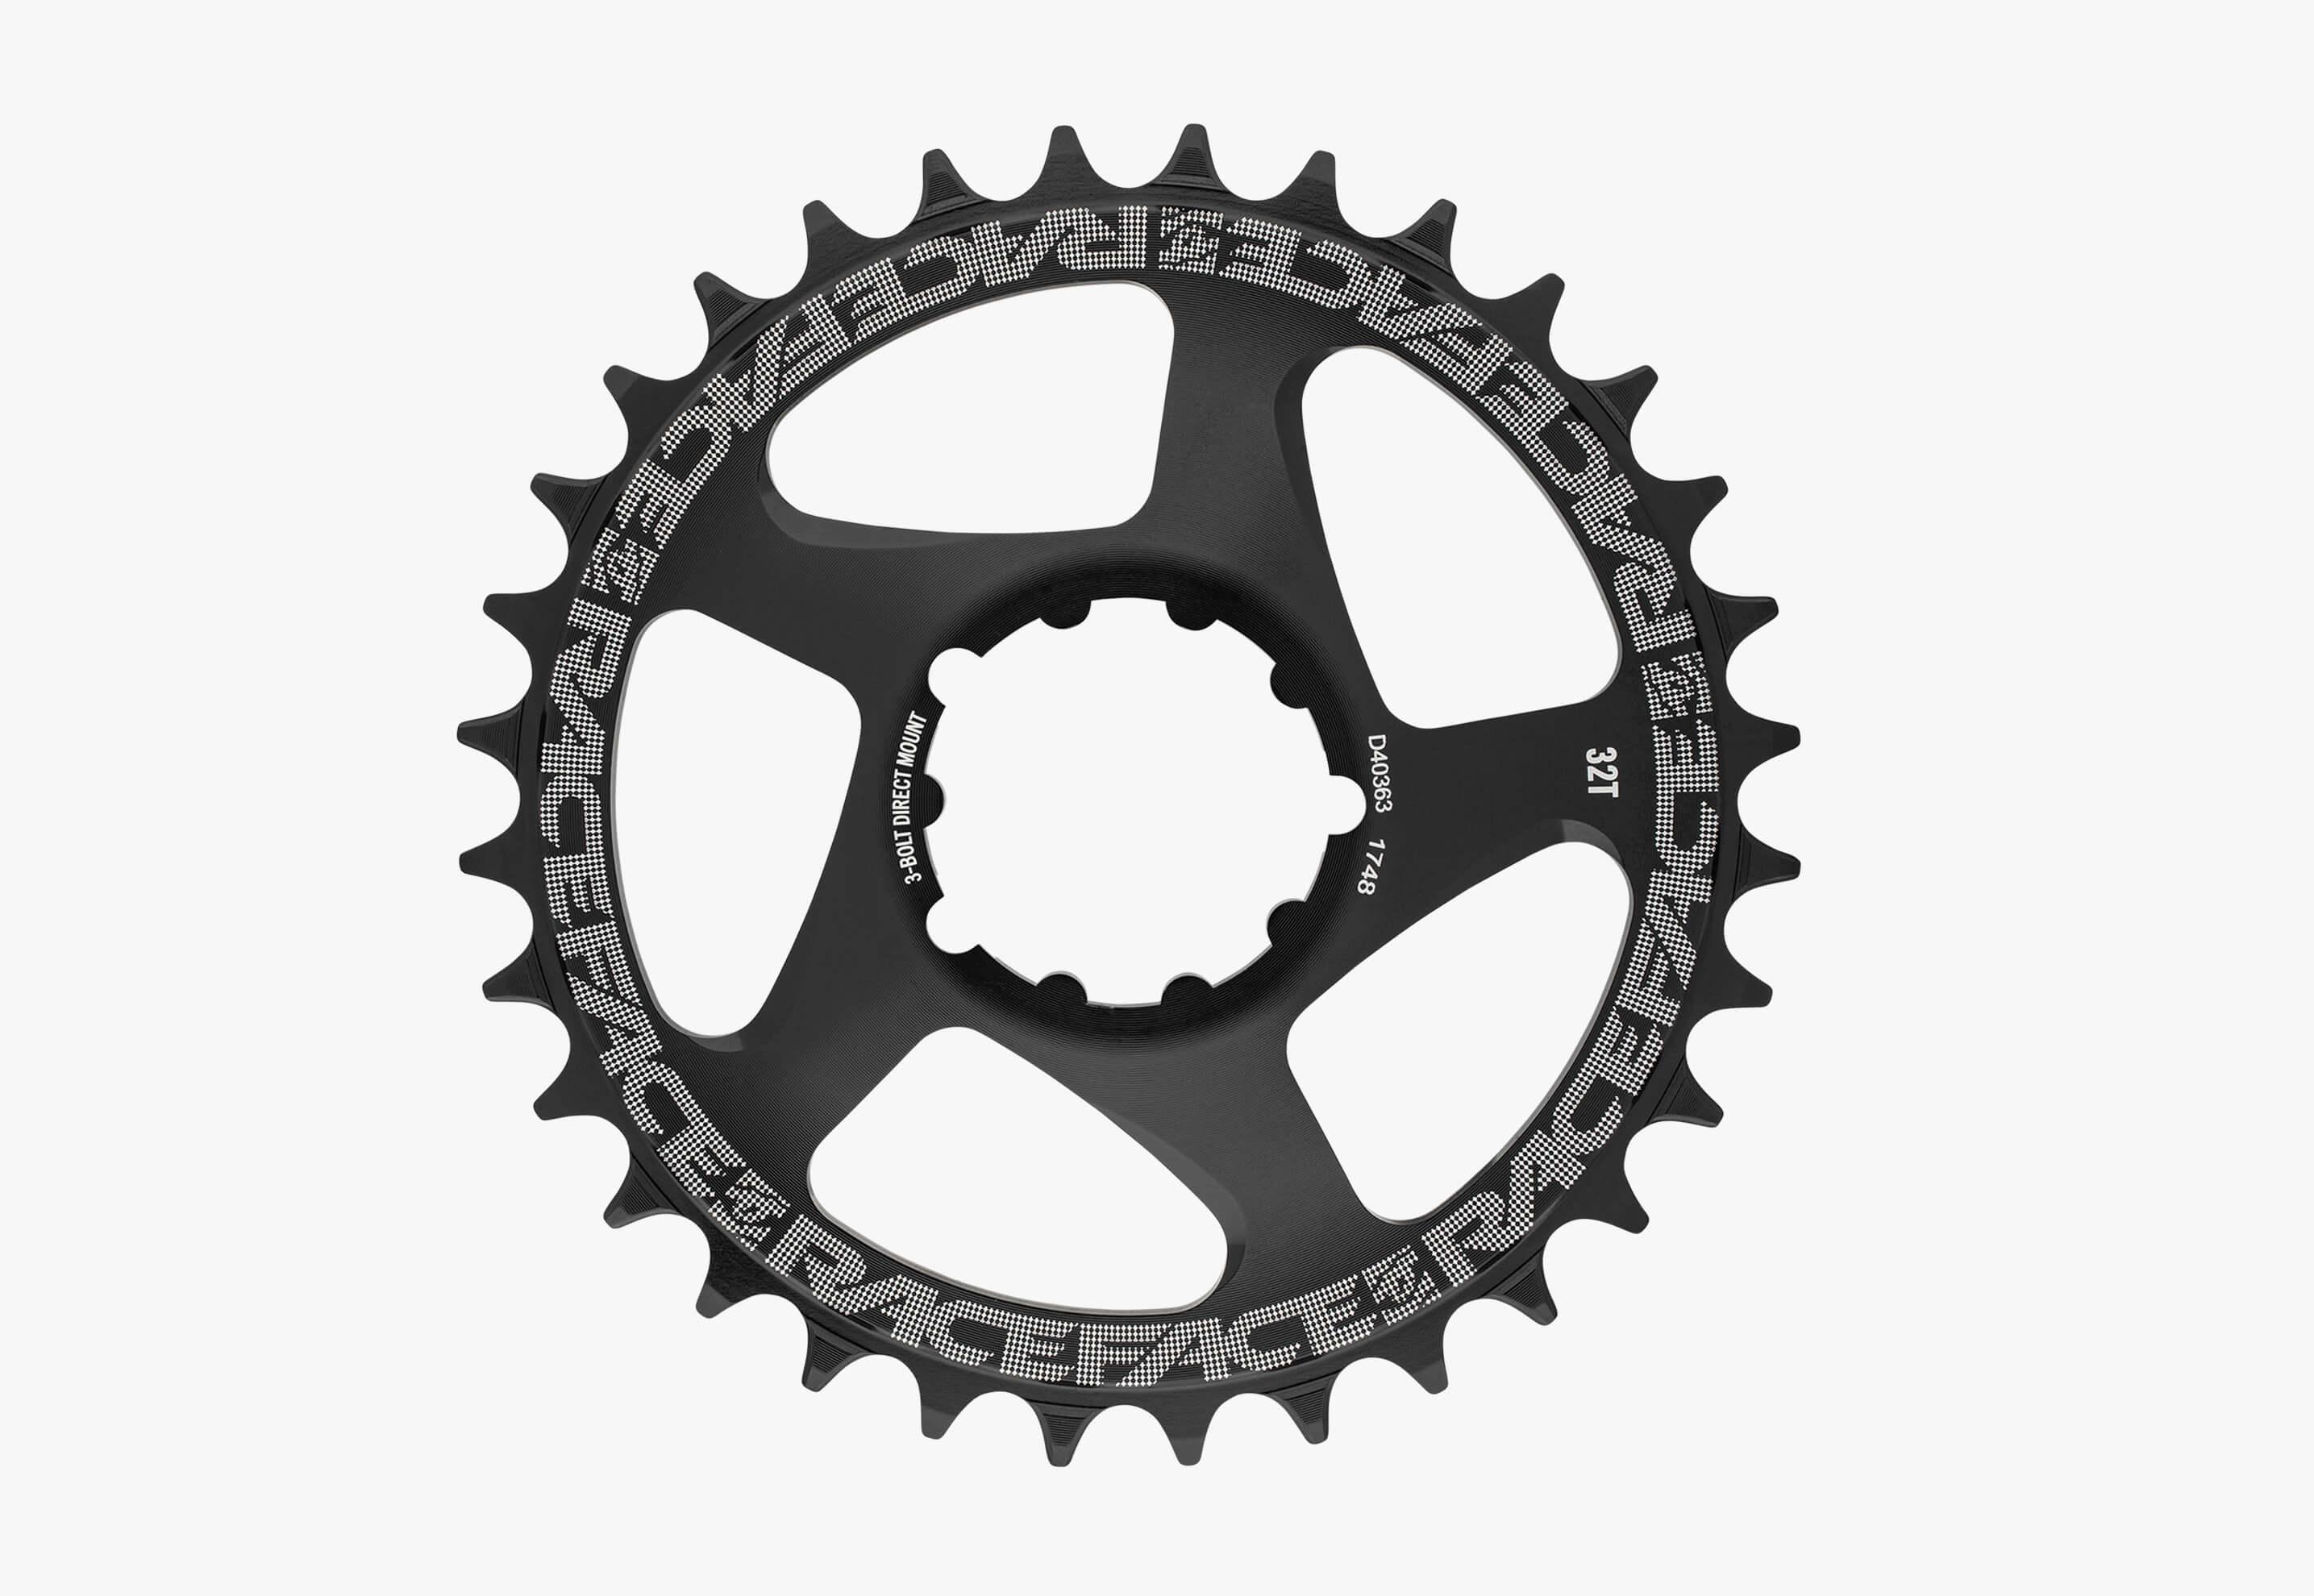 1x Chainring ,Direct Mount - 3 Bolt Compatible